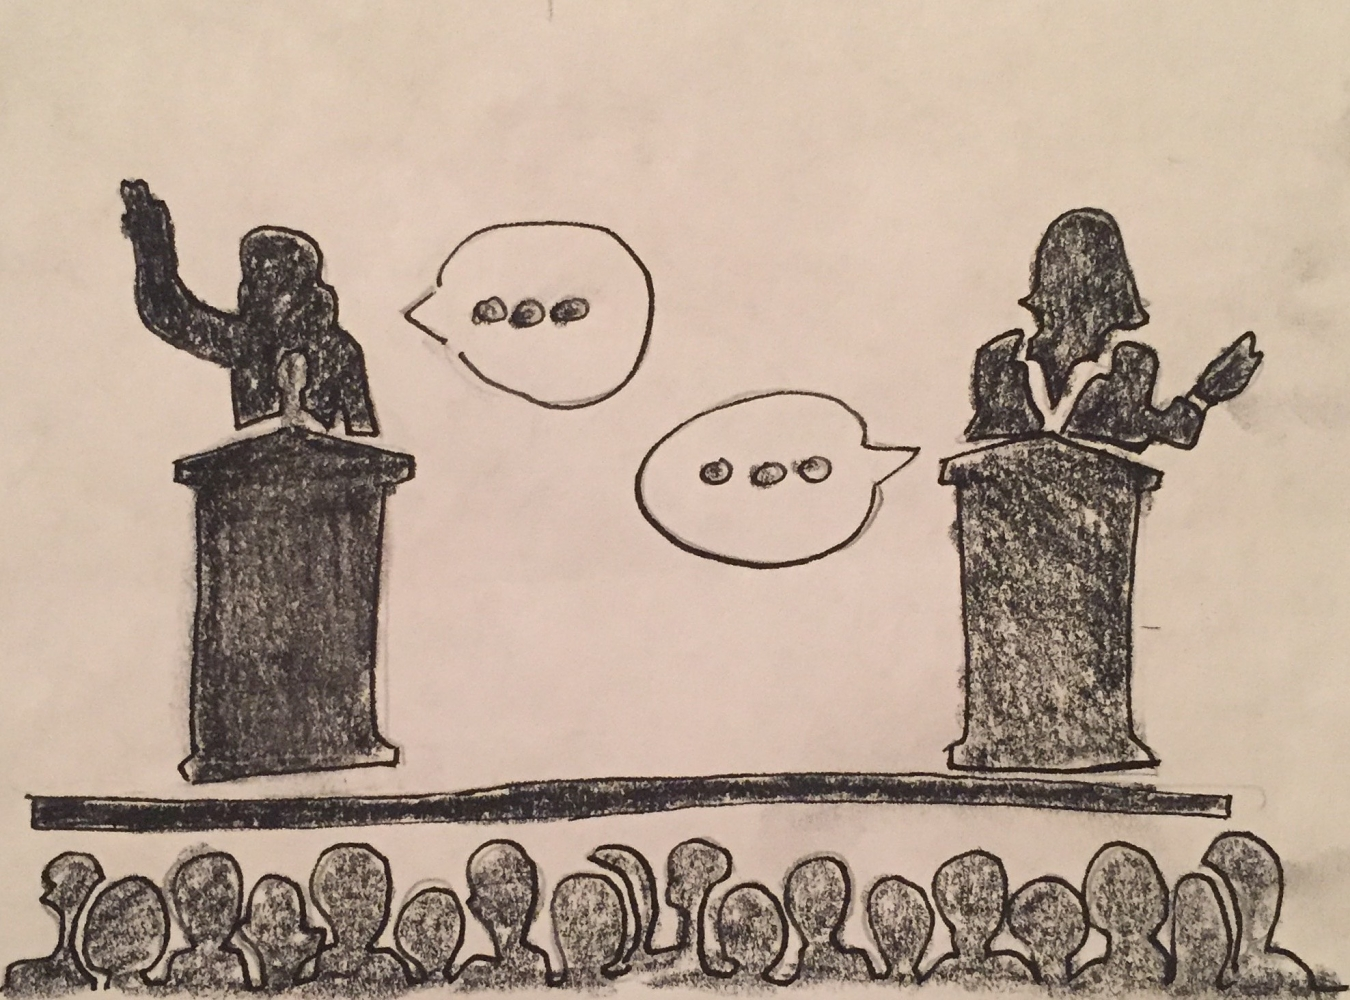 Spotlight: Speech and Debate Club